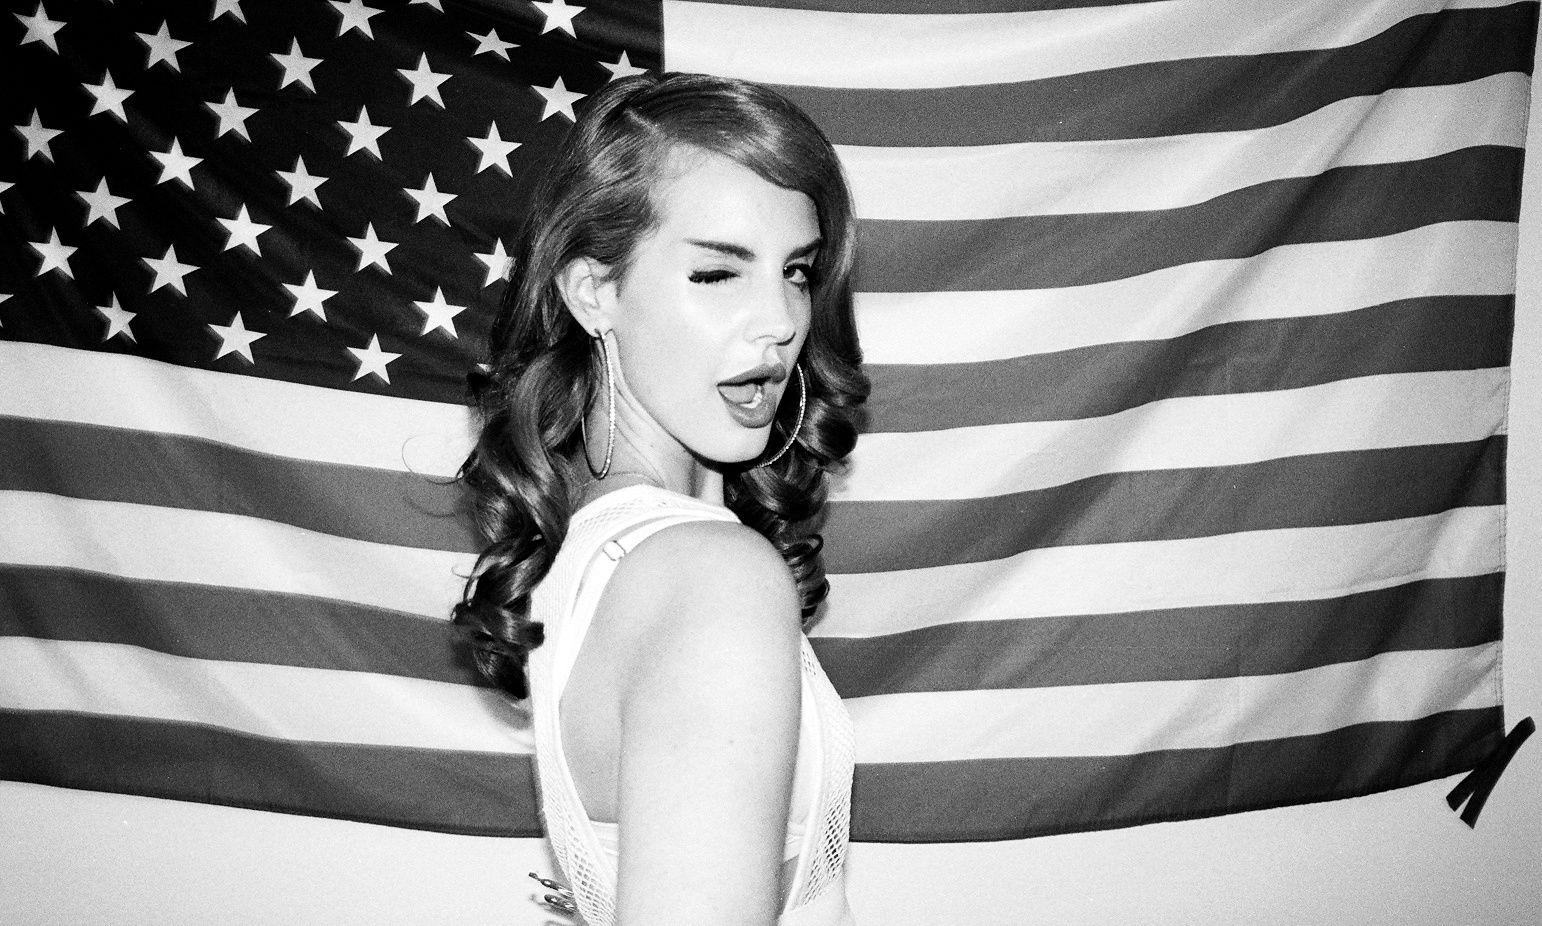 Google themes lady gaga - Lana Del Rey Disses Lady Gaga In New Leaked Song So Legit